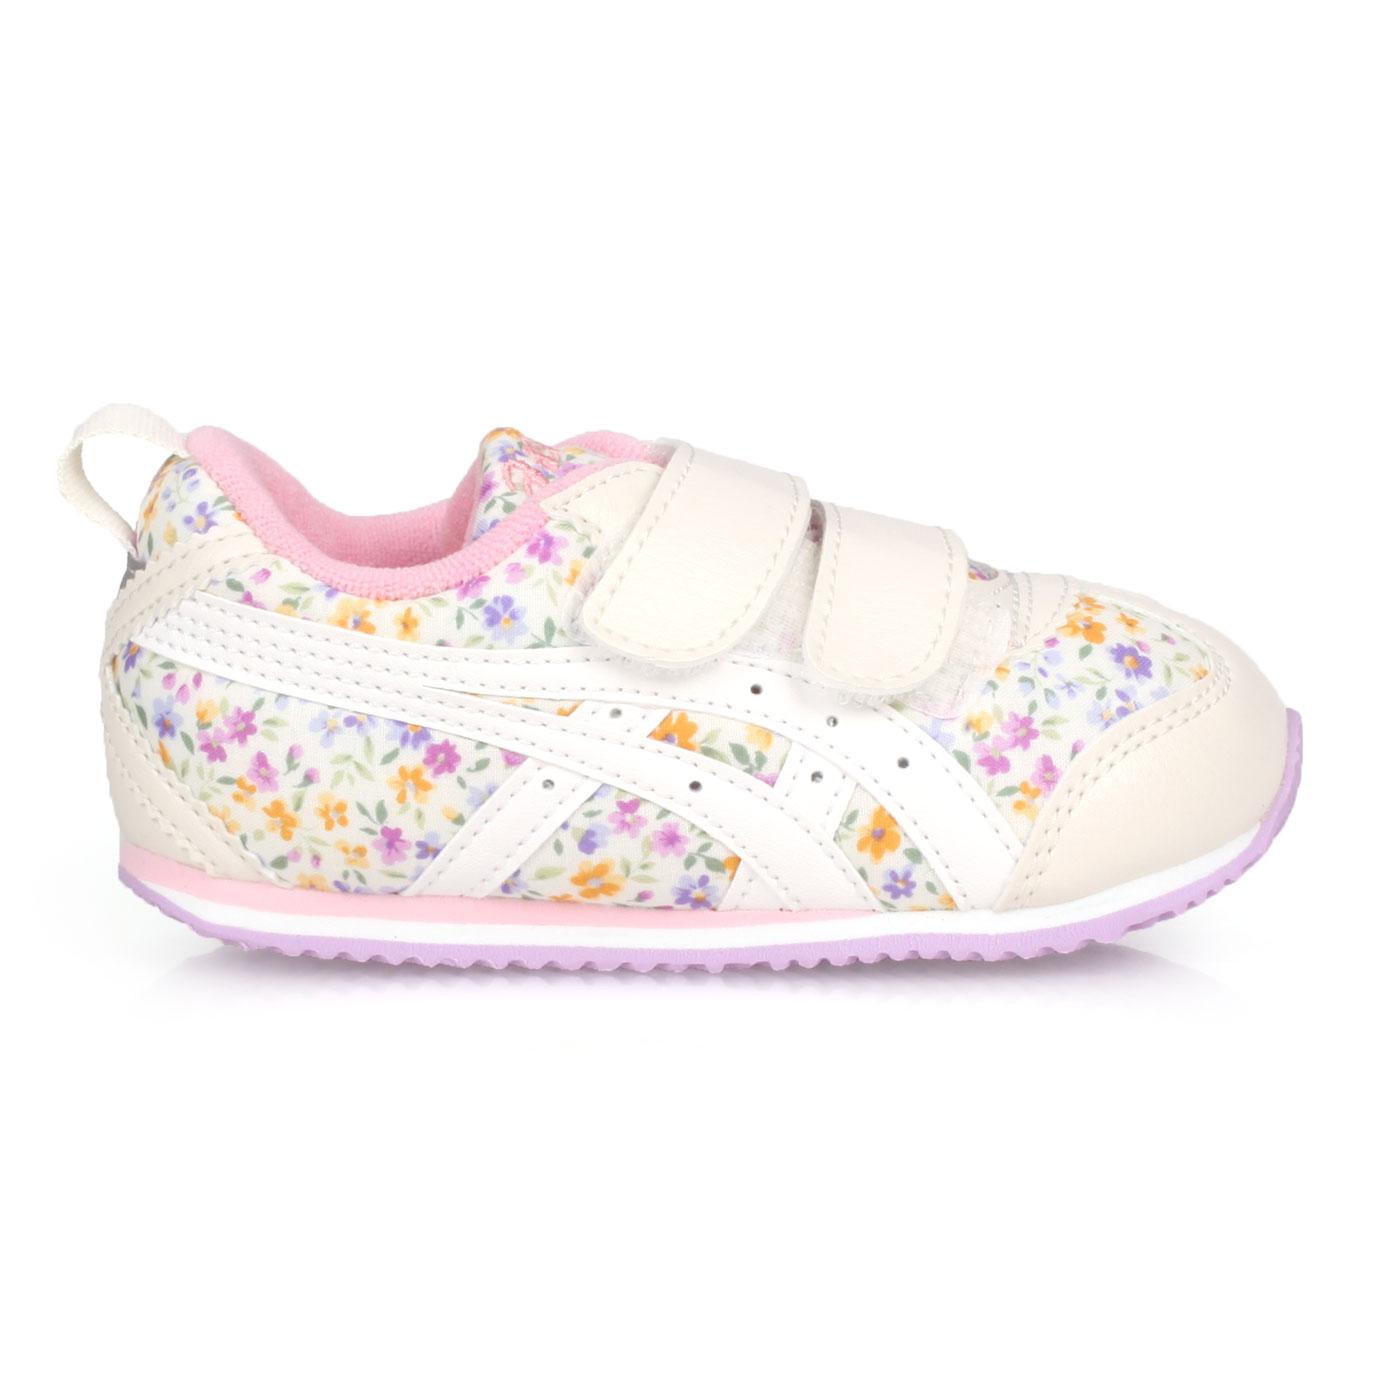 ASICS 小童休閒運動鞋  @MEXICO NARROW BABY CT3@1144A009-500 - 米白粉紫